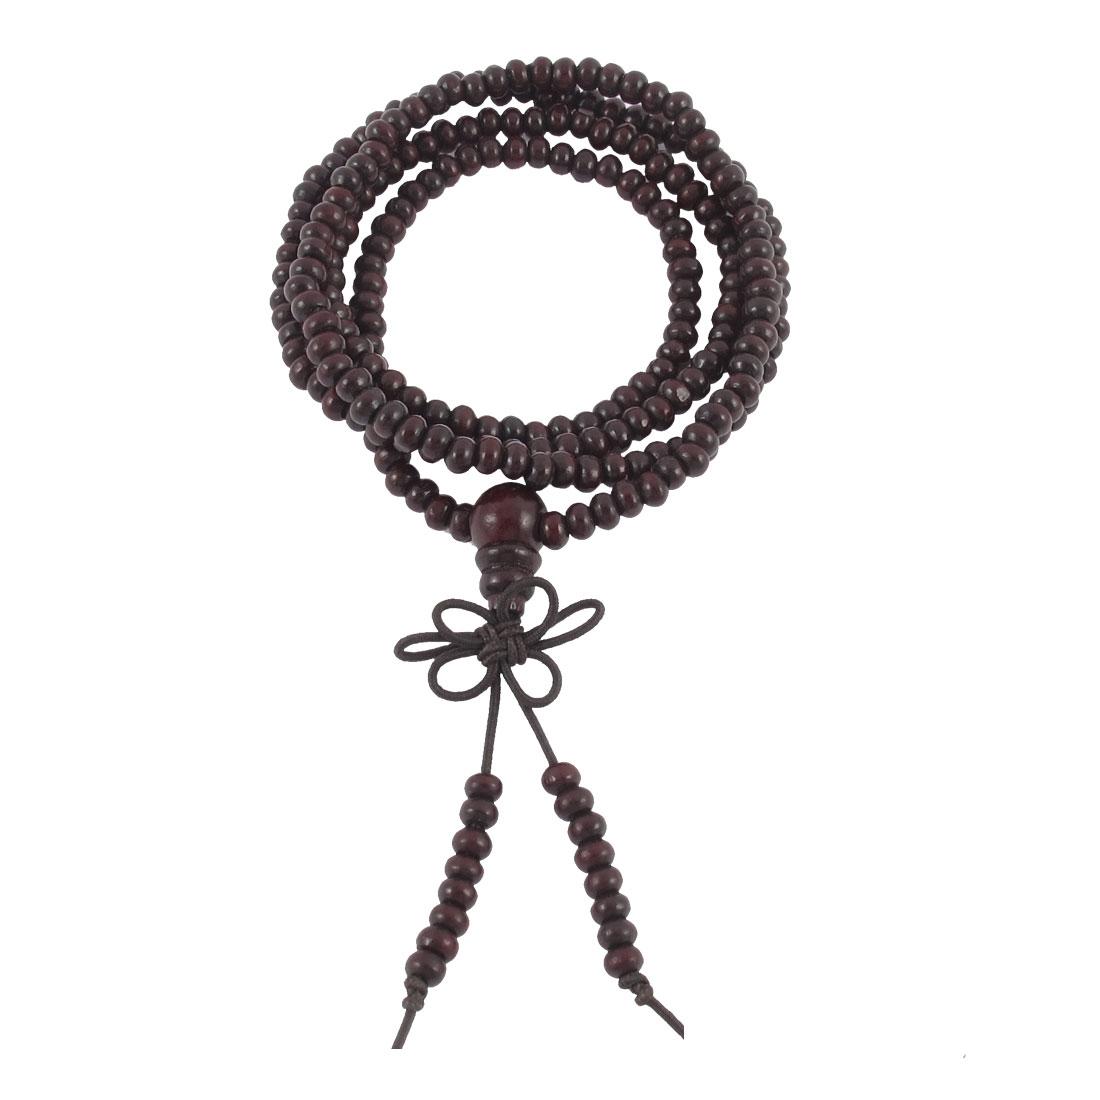 Woman Red Sandalwood 216 Mini Beads Adornment Knot Pendant Elastic Bracelet Bangle